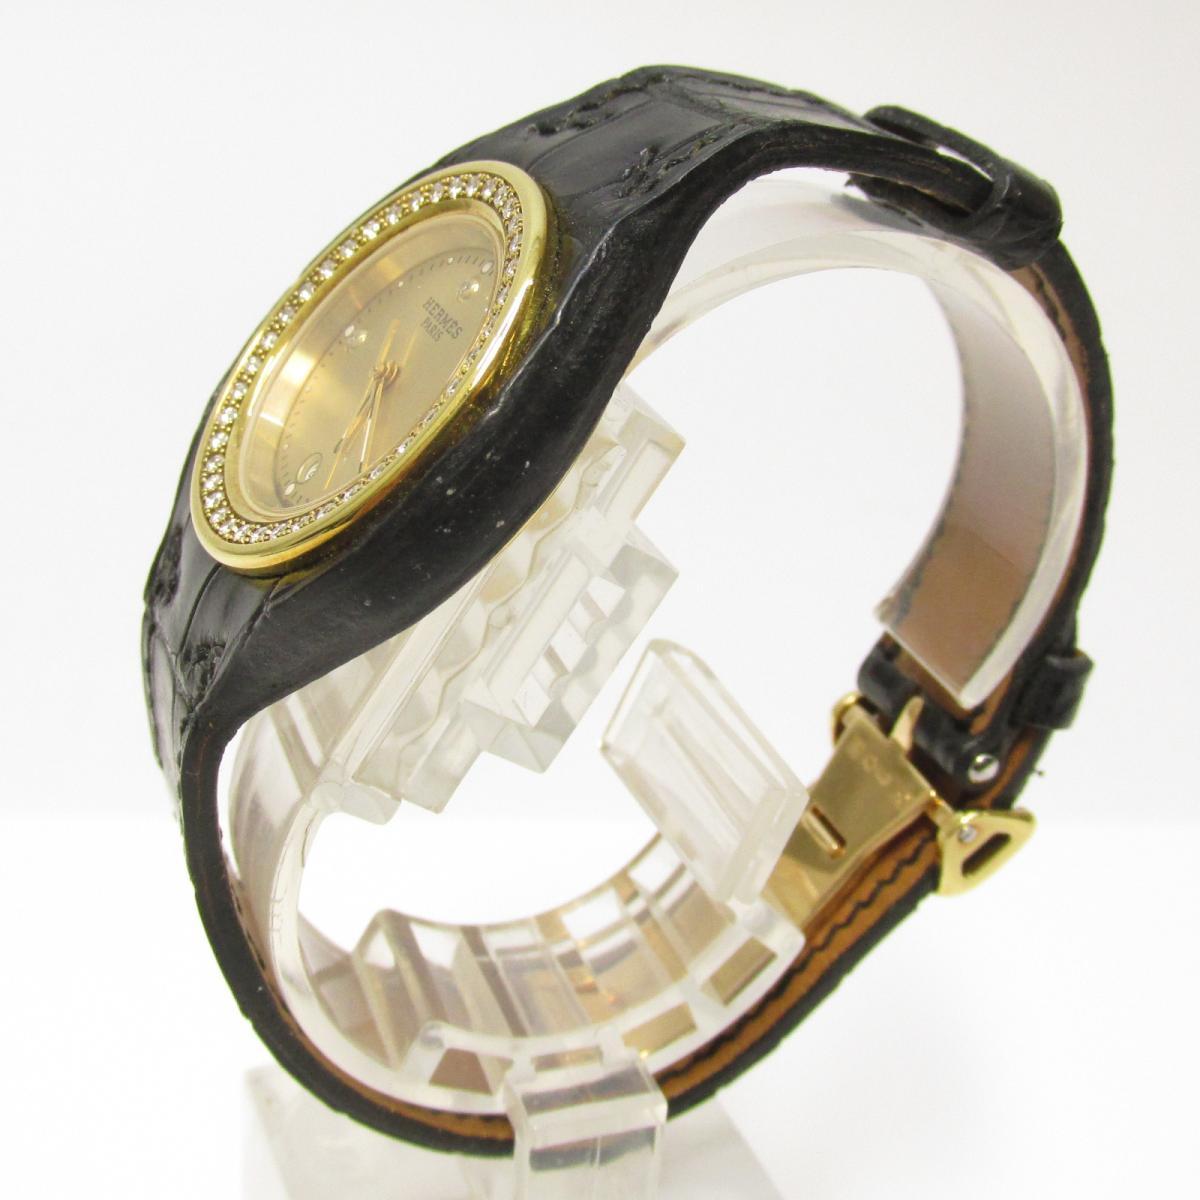 HERMES 時計 HA1.286 アーネ ベゼルダイヤモンド 3Pダイヤモンド 時計/レディース